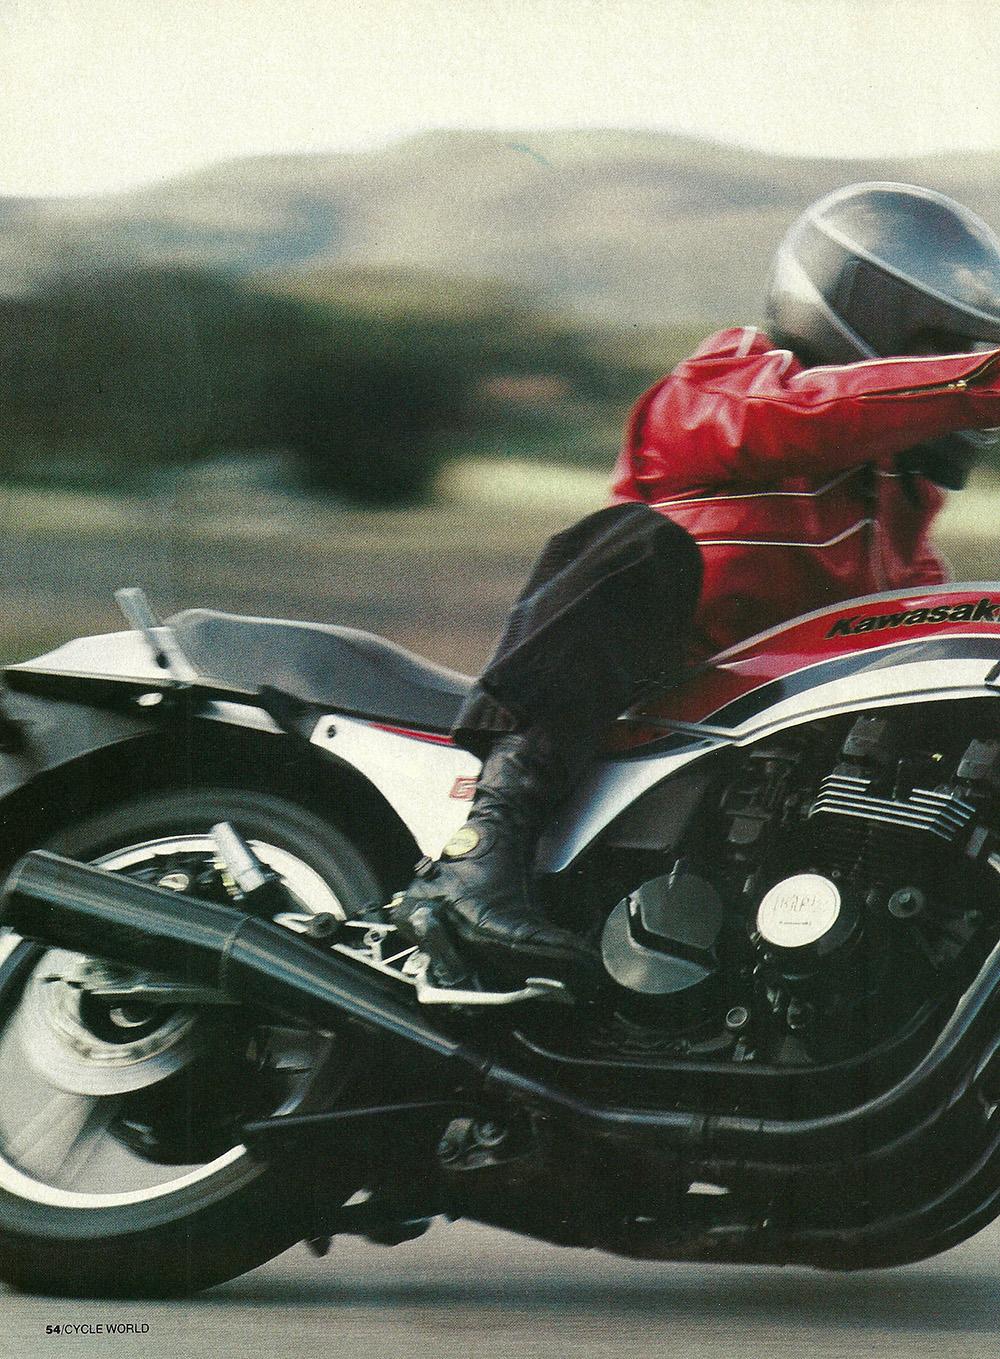 1984 Kawasaki GPz550 road test 03.jpg